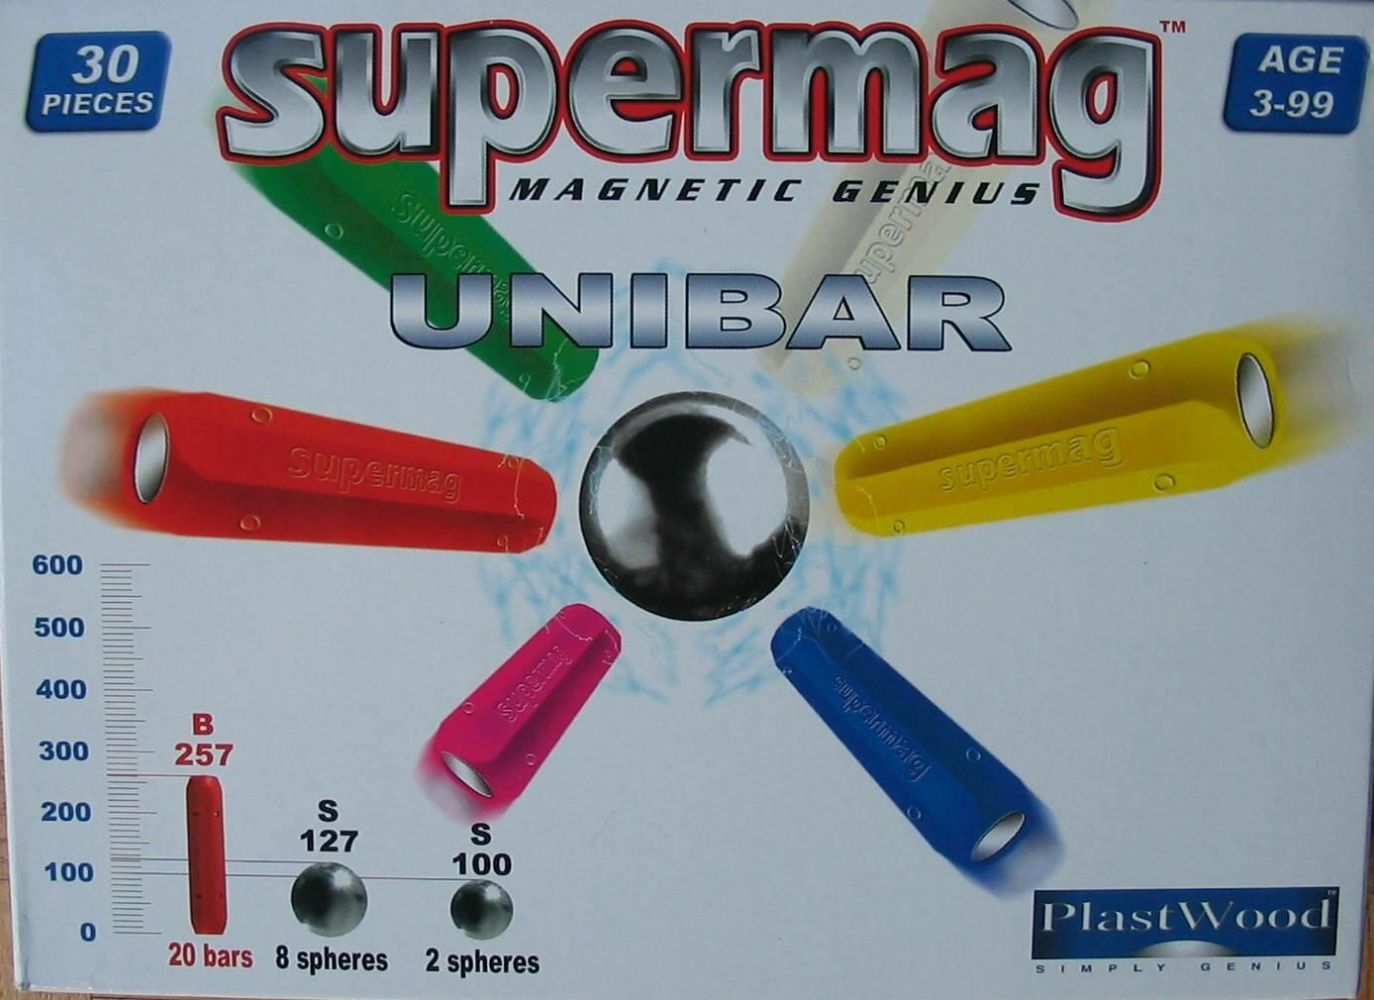 Supermag Magnet-Konstruktionskasten UNIBAR 30 Teile (Farbe: Blau) Bild 1